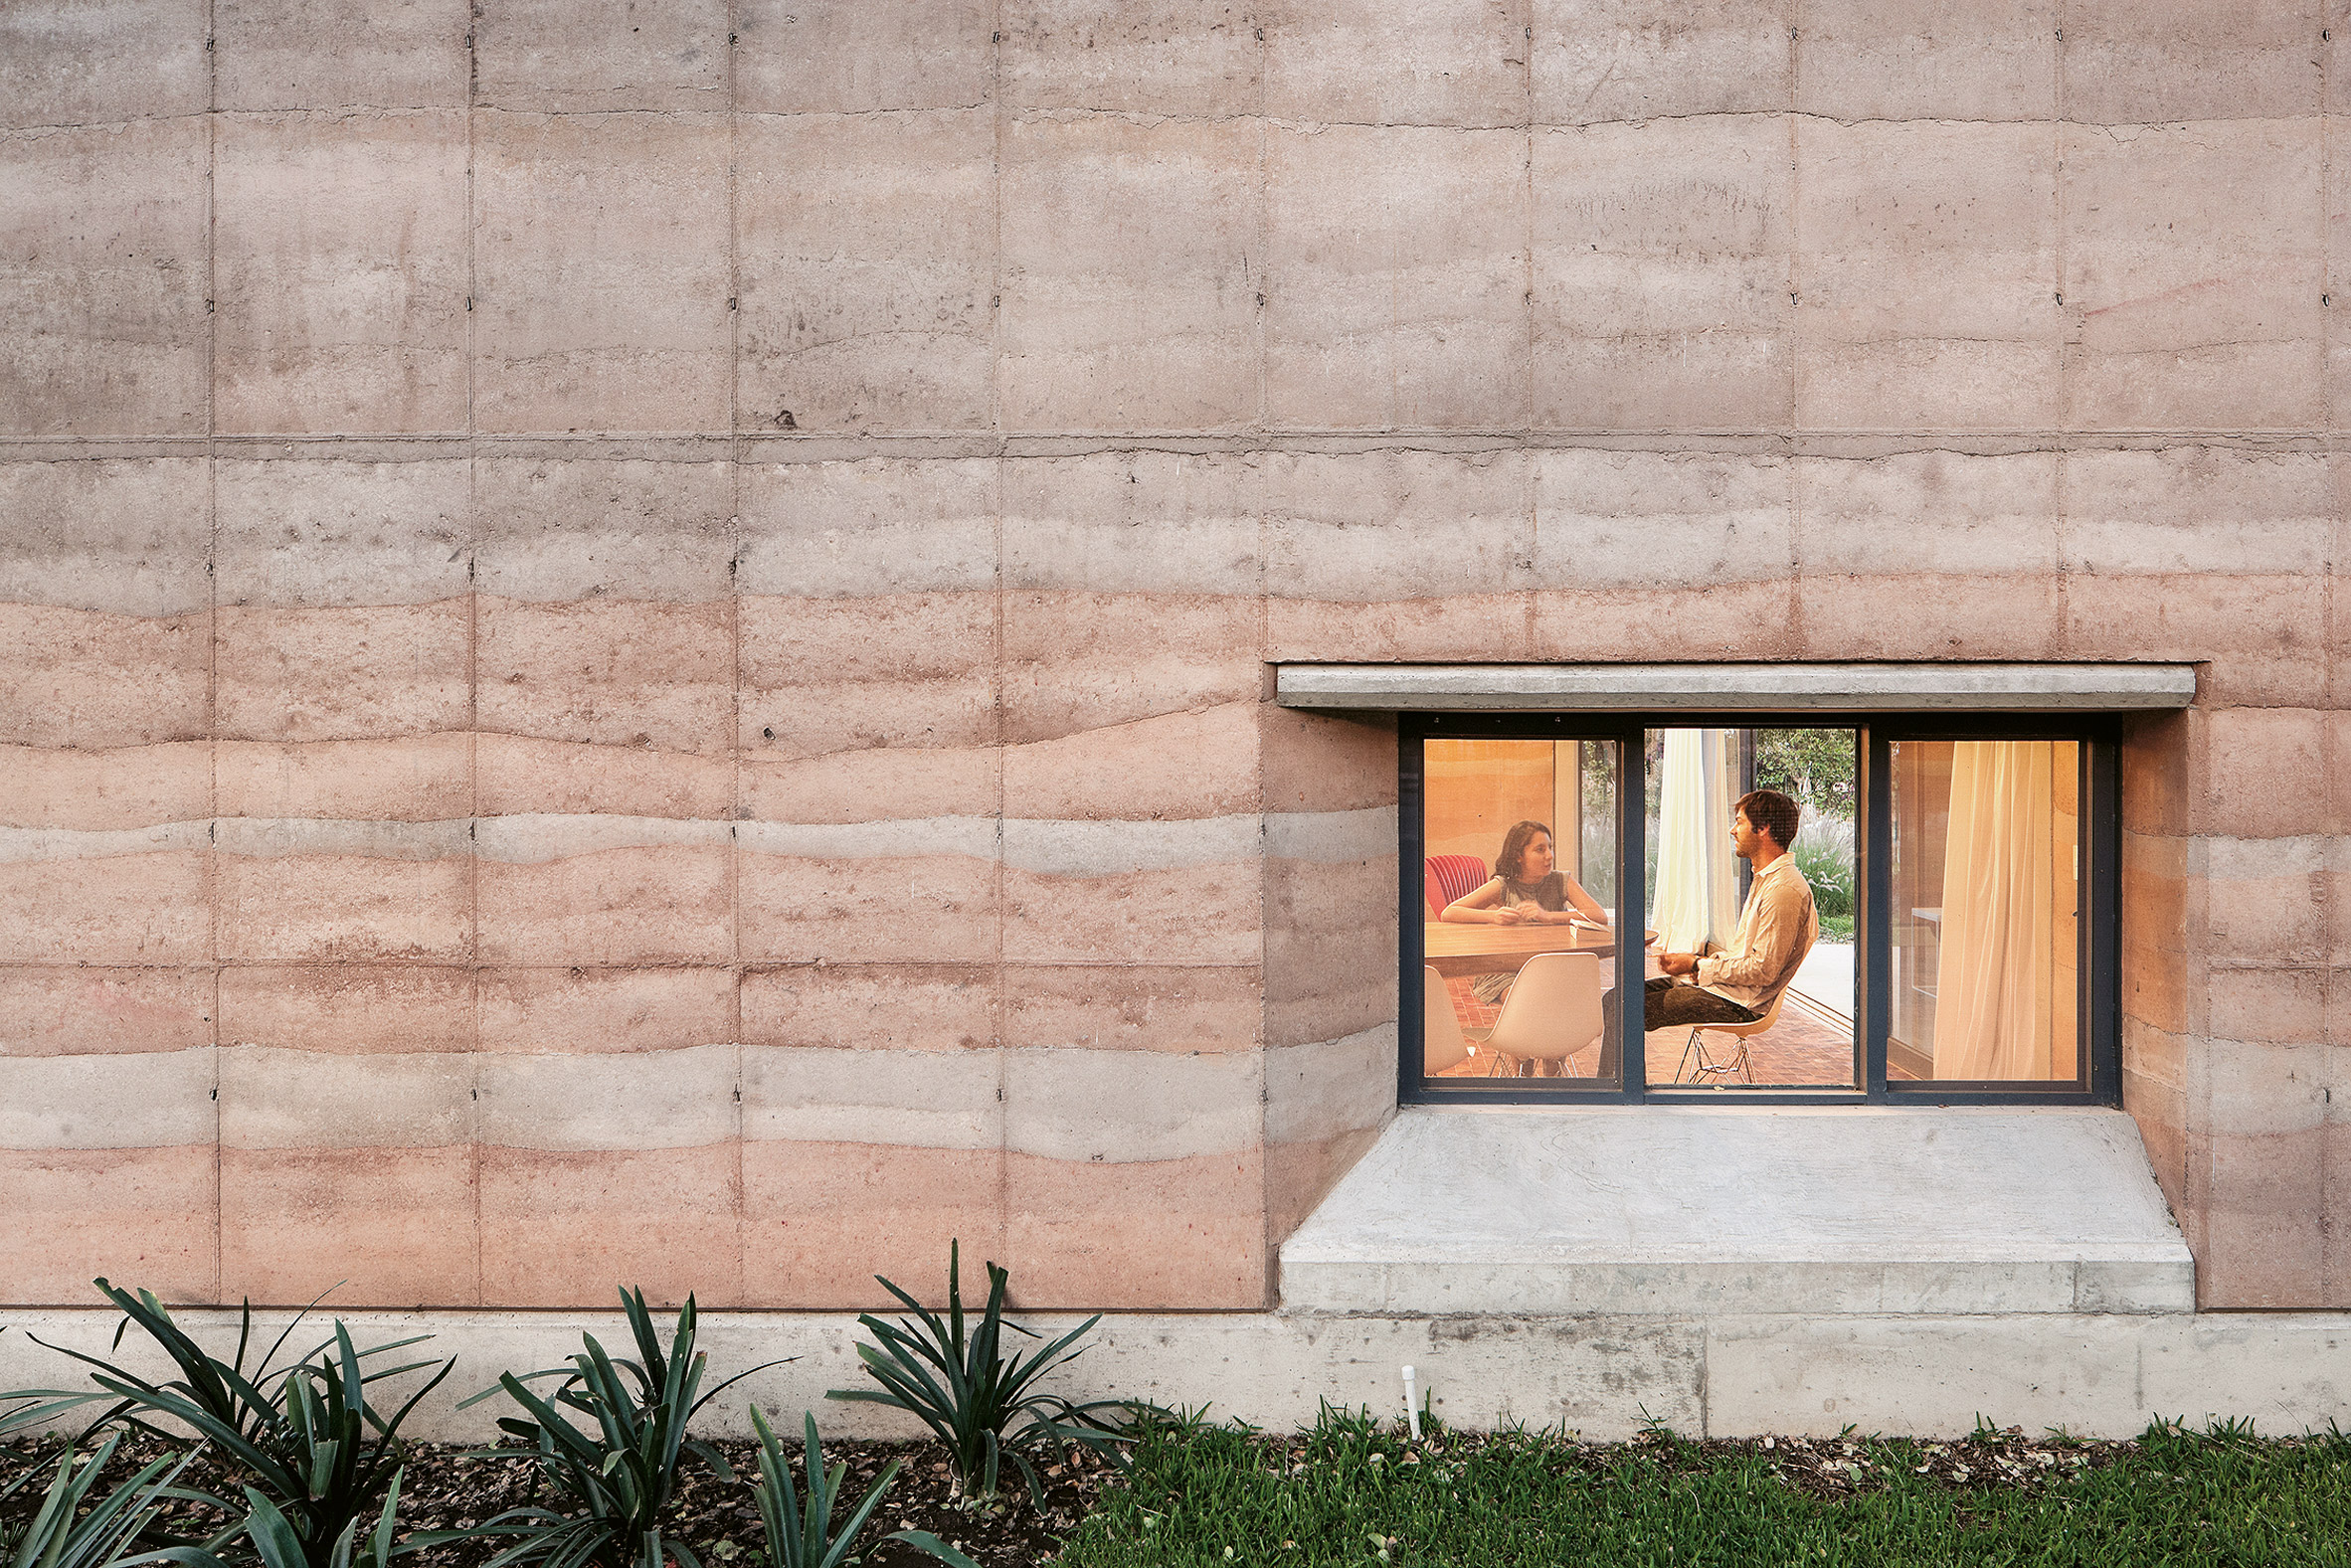 Casa Ajijic by Tatiana Bilbao Estudio. Photo is by Iwan Baan